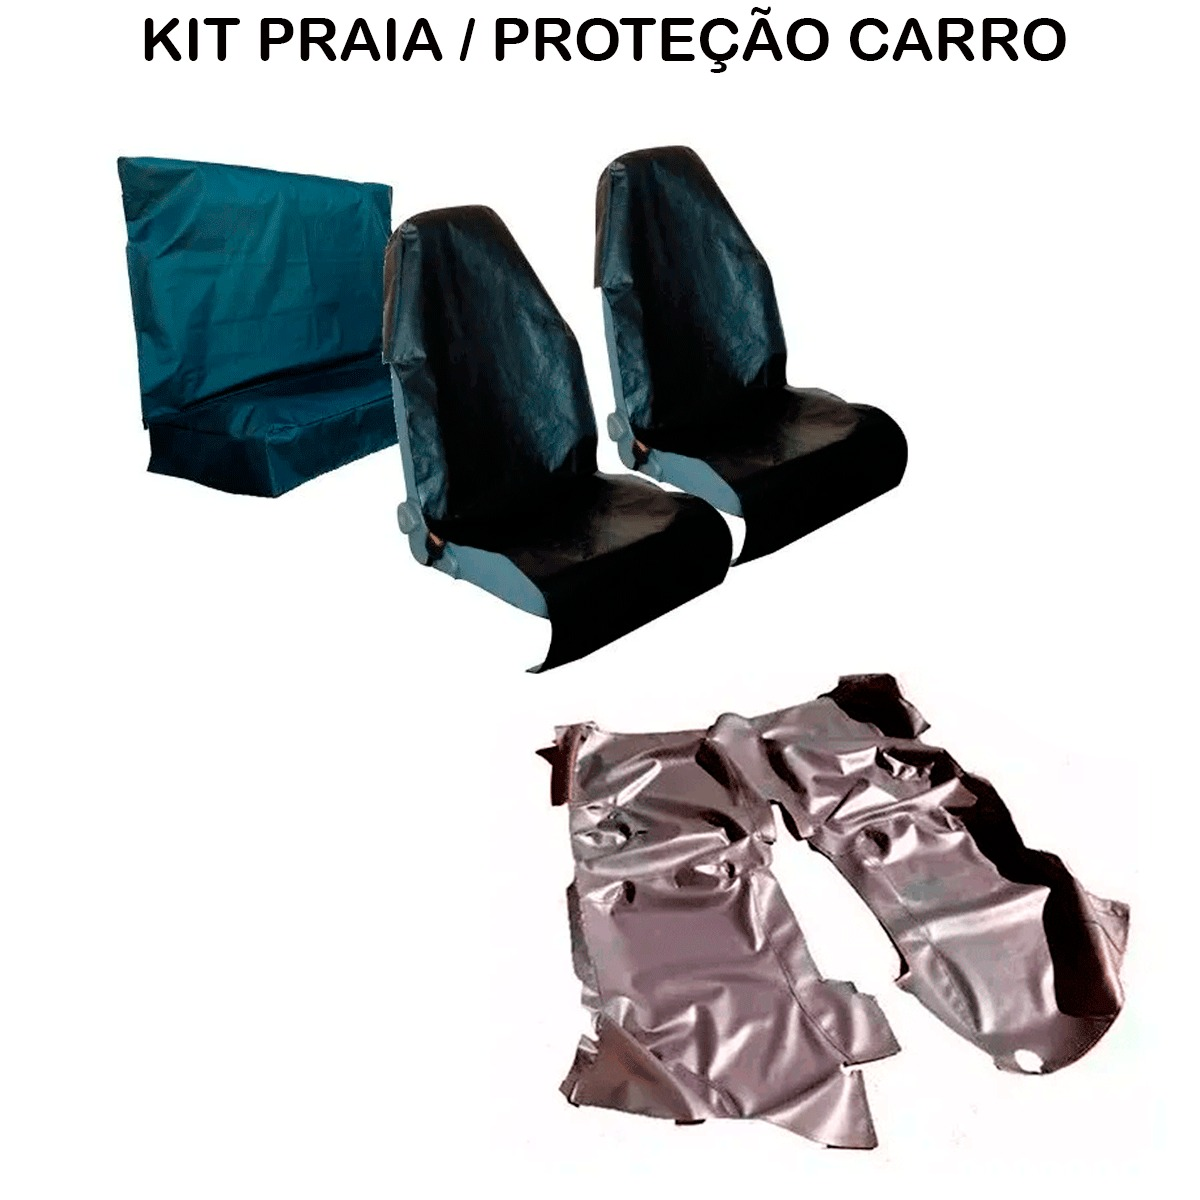 Tapete Em Vinil Ford New Fiesta todos + Capa Banco Protecao Banco Areia Suor Academia